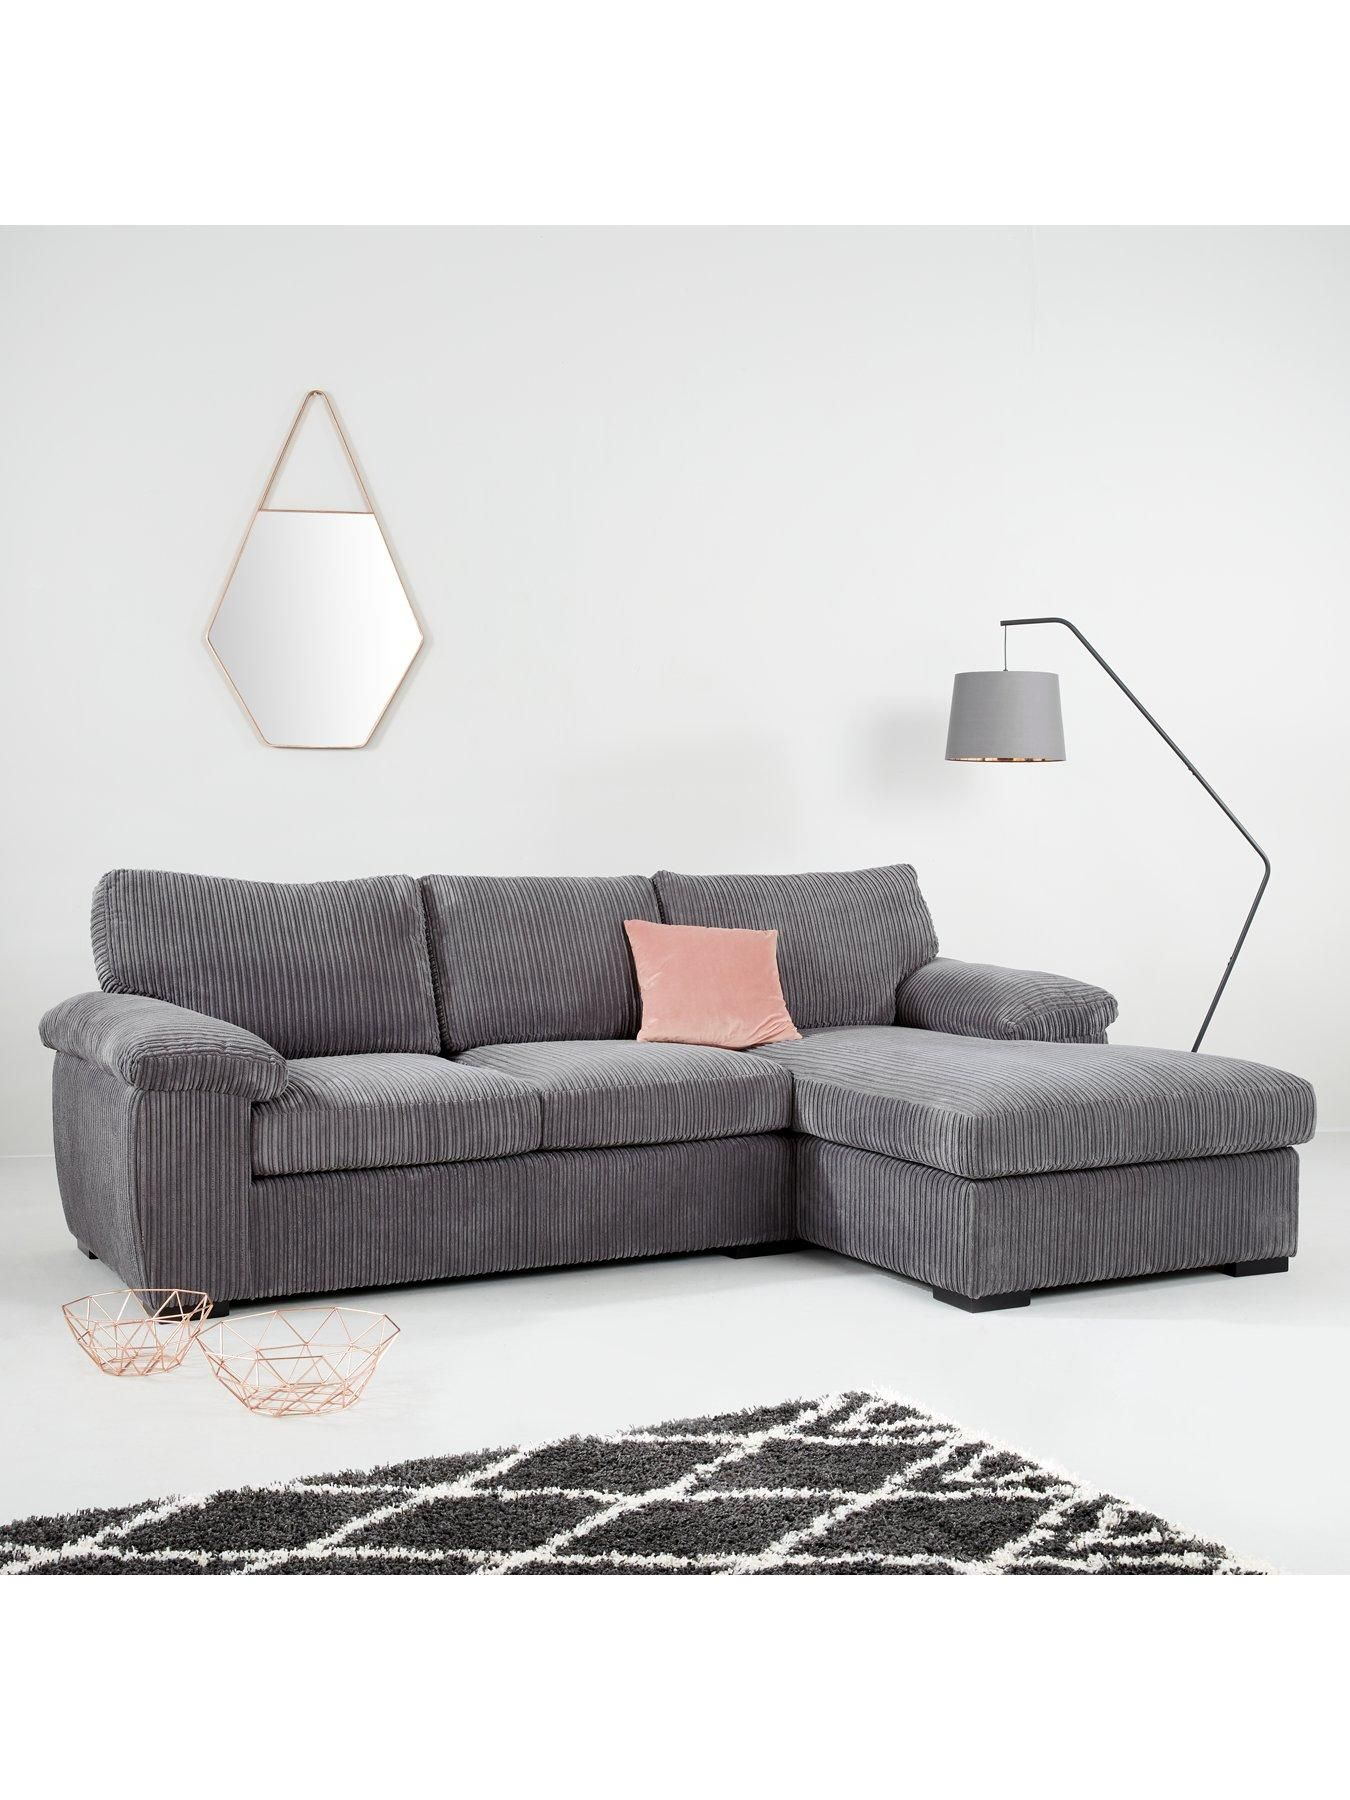 Amalfi 3 Seater Right Hand Standard Back Fabric Corner Chaise Sofa Charcoal Chaise Sofa Sofa New Furniture